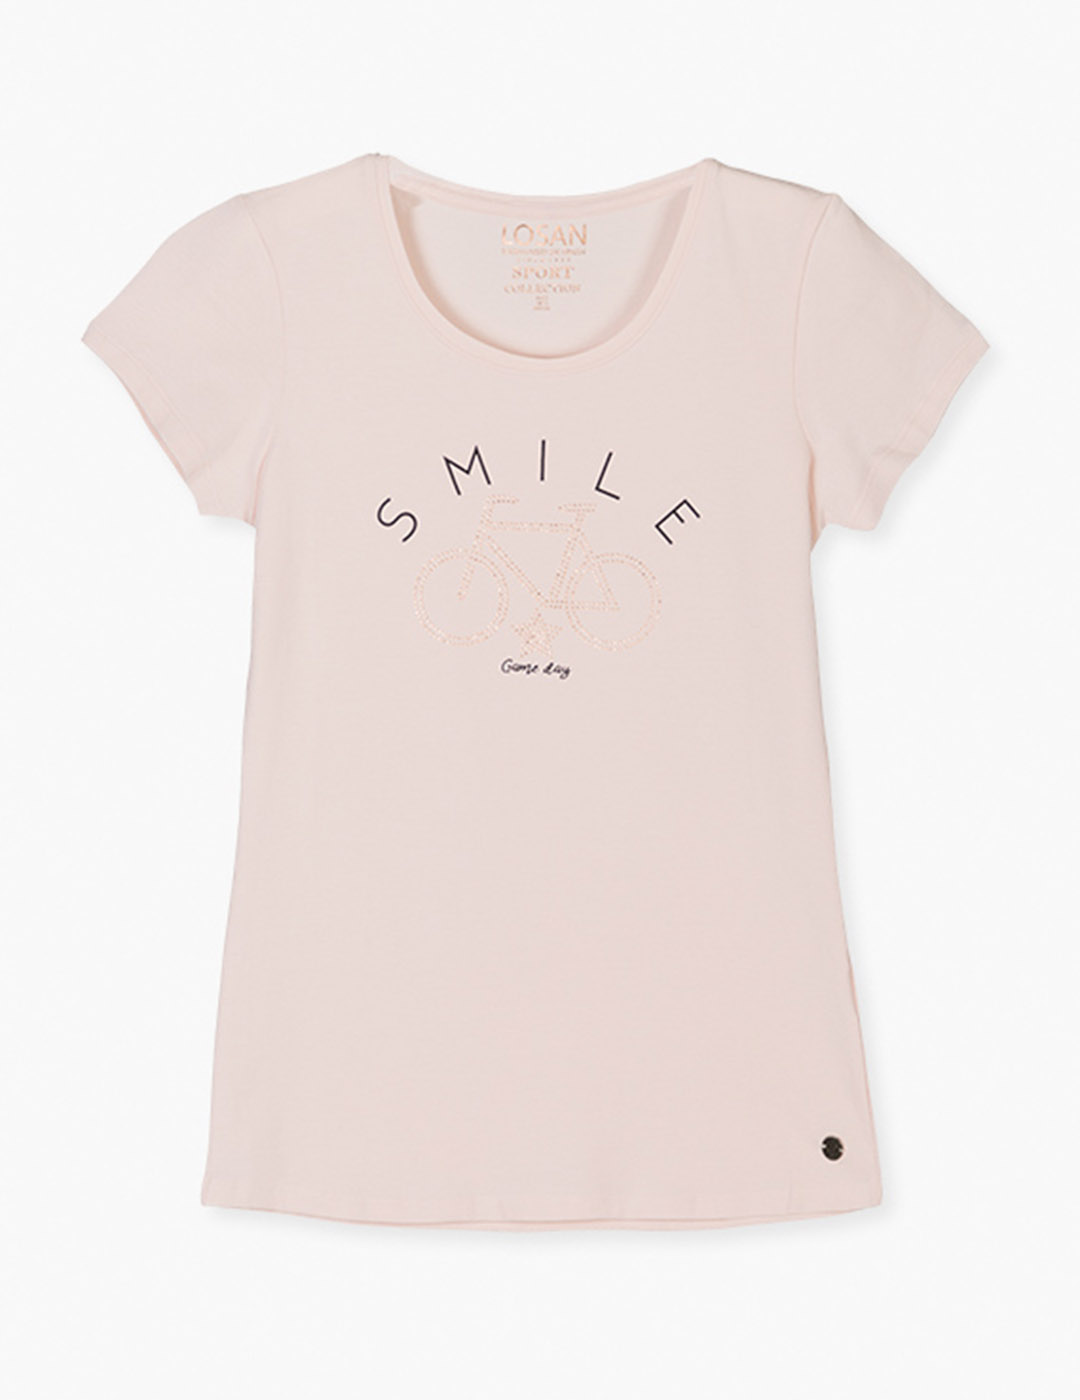 Camiseta salmon estampada Losan para muj